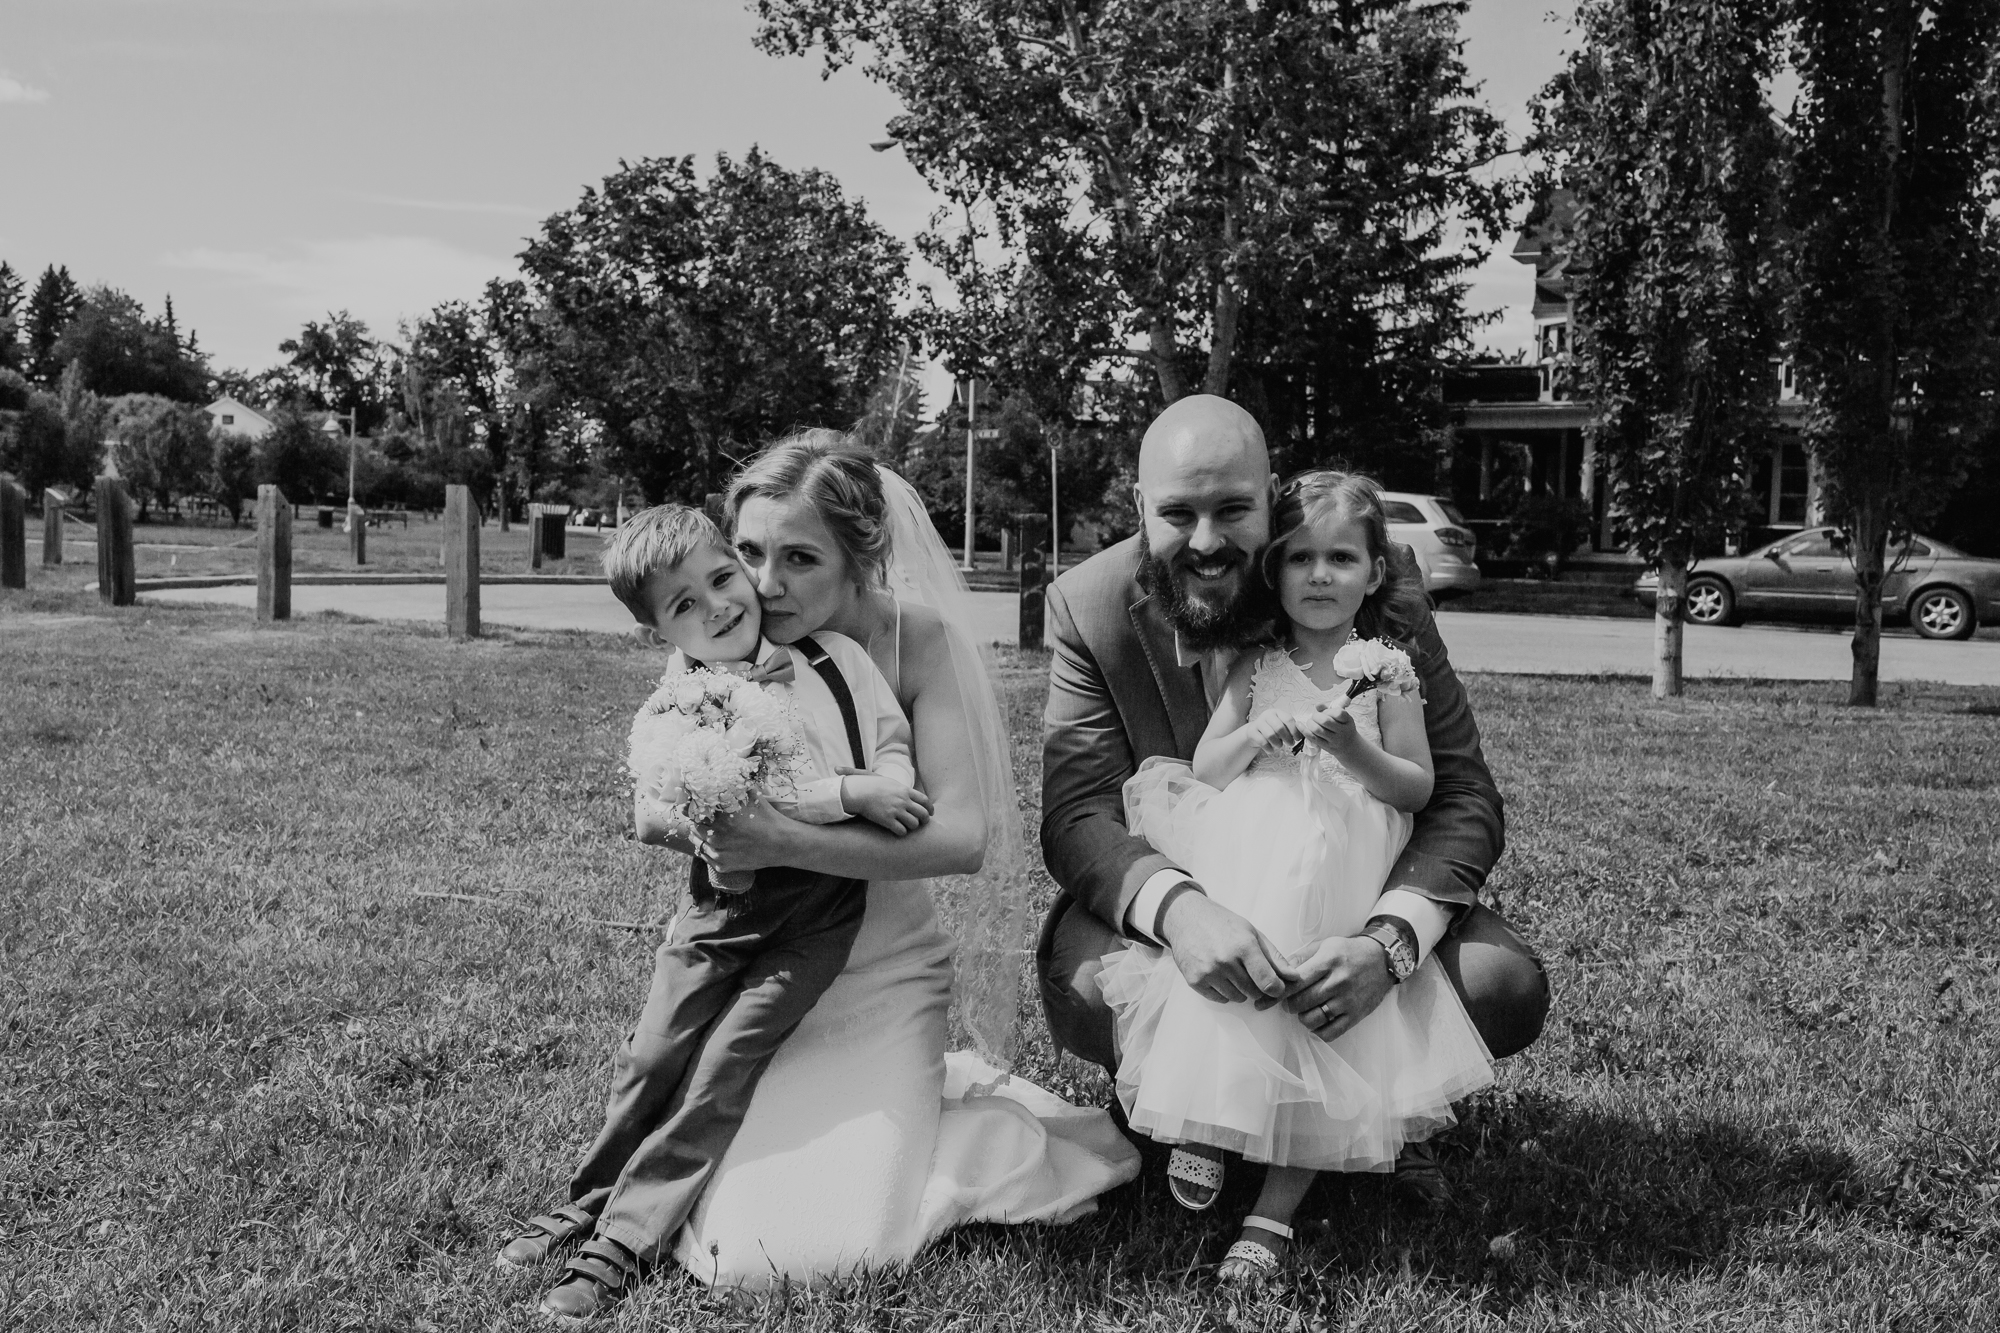 Calgary-wedding-photographer-am-56.jpg